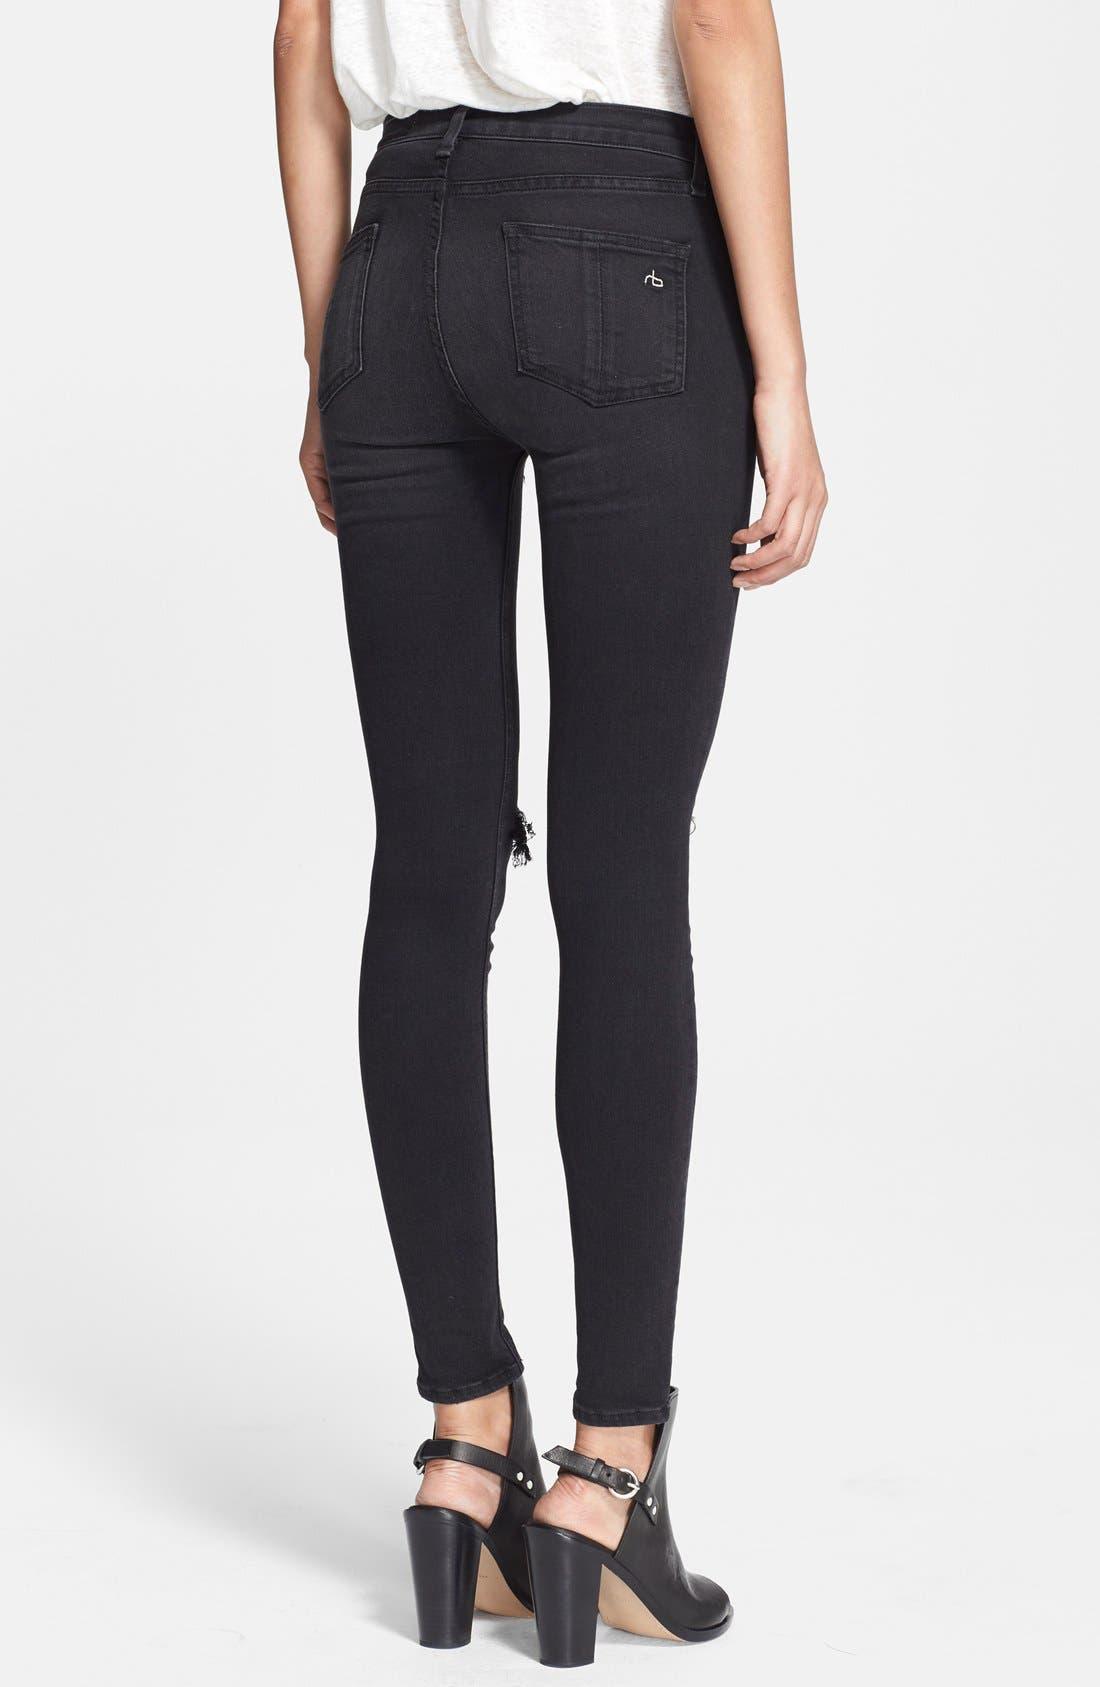 RAG & BONE,                             JEAN High Rise Ultra Skinny Jeans,                             Alternate thumbnail 2, color,                             001